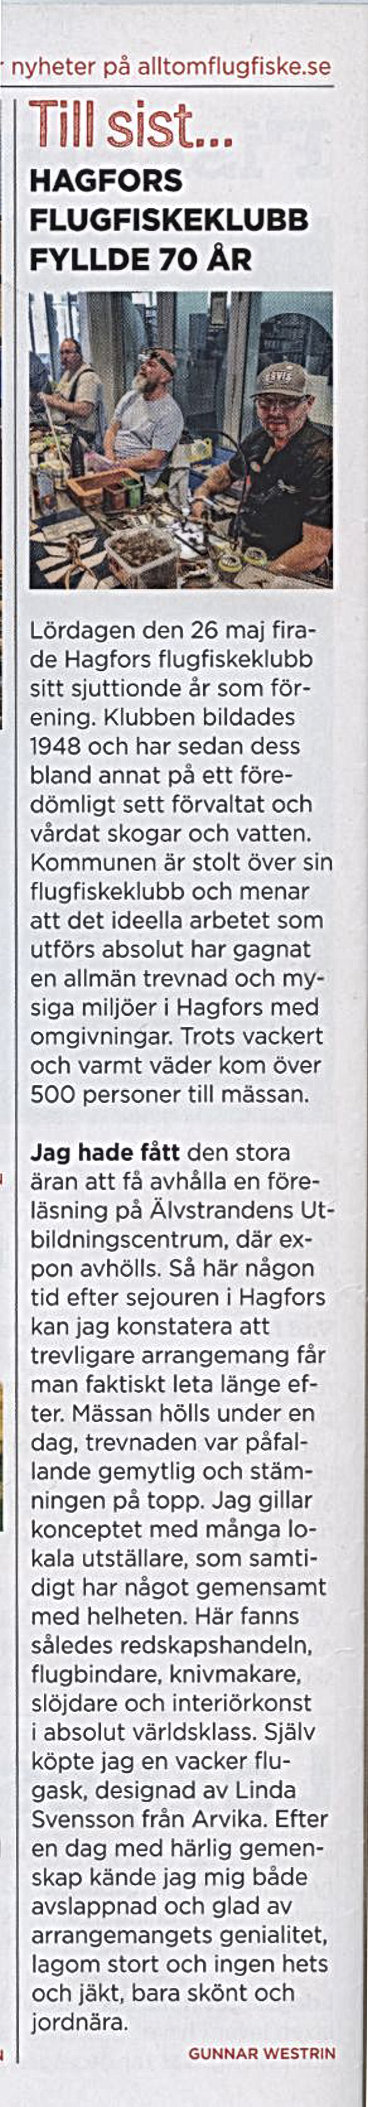 Flugfiskemässan_Westrins_artikel.jpg